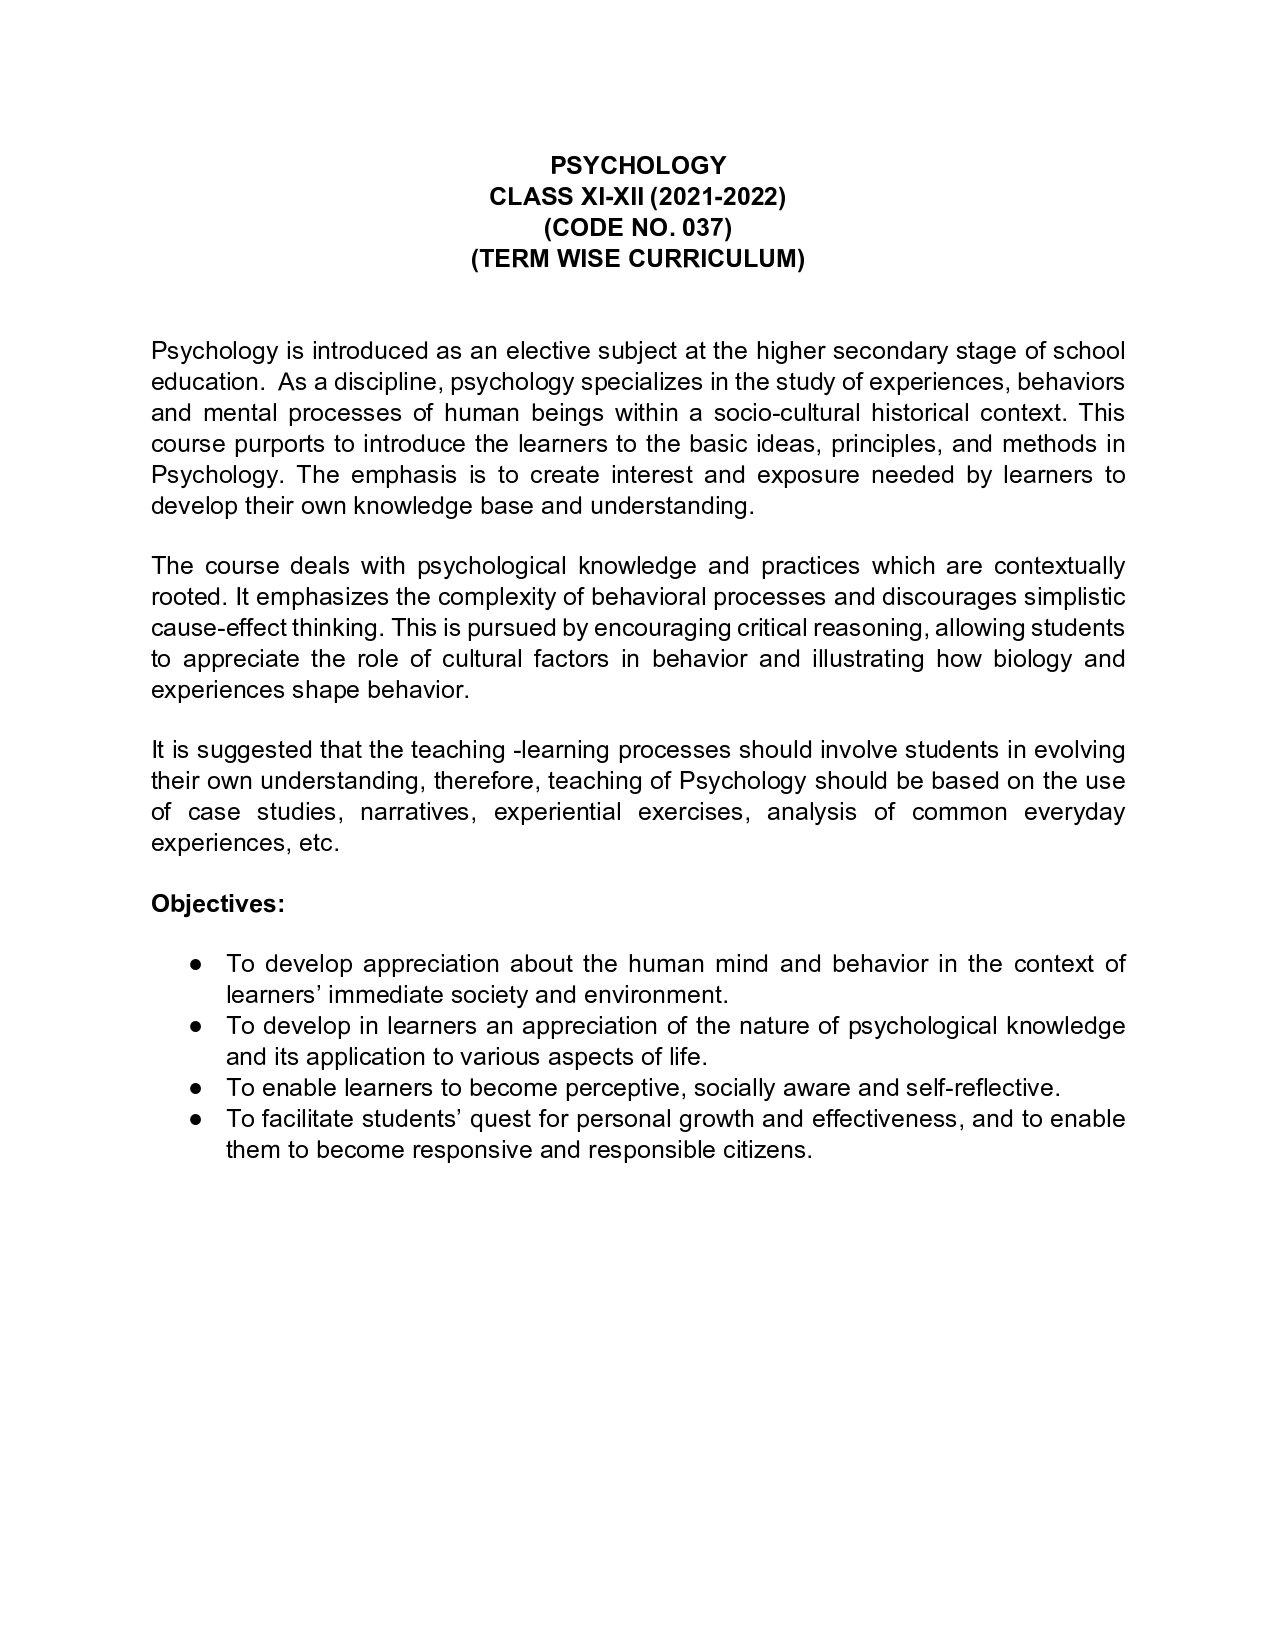 CBSE Class 12 Term Wise Syllabus 2021-22 Psychology - Page 1